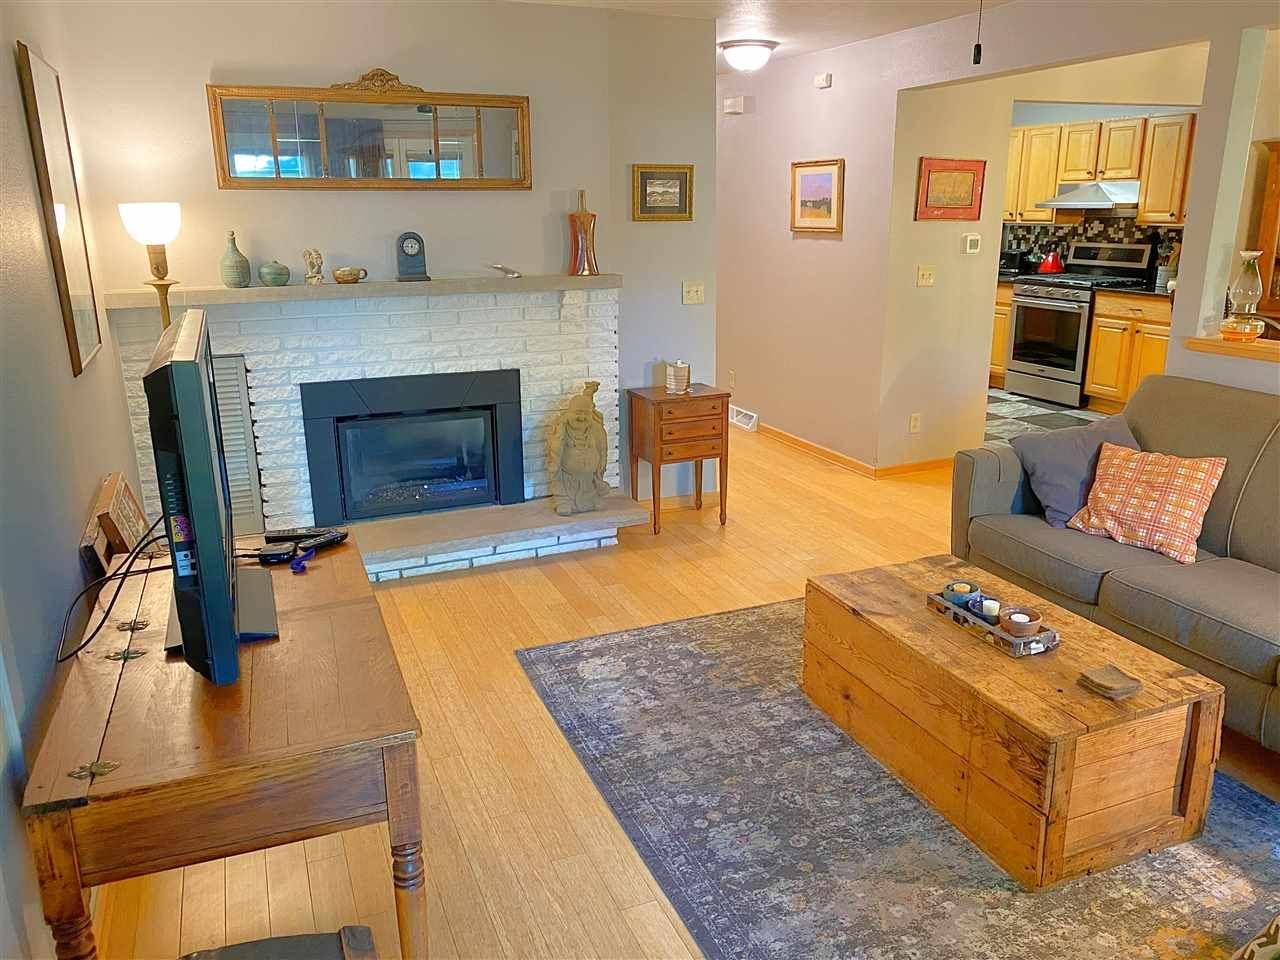 20 Waunona Woods Ct, Madison, WI 53713 - #: 1892701